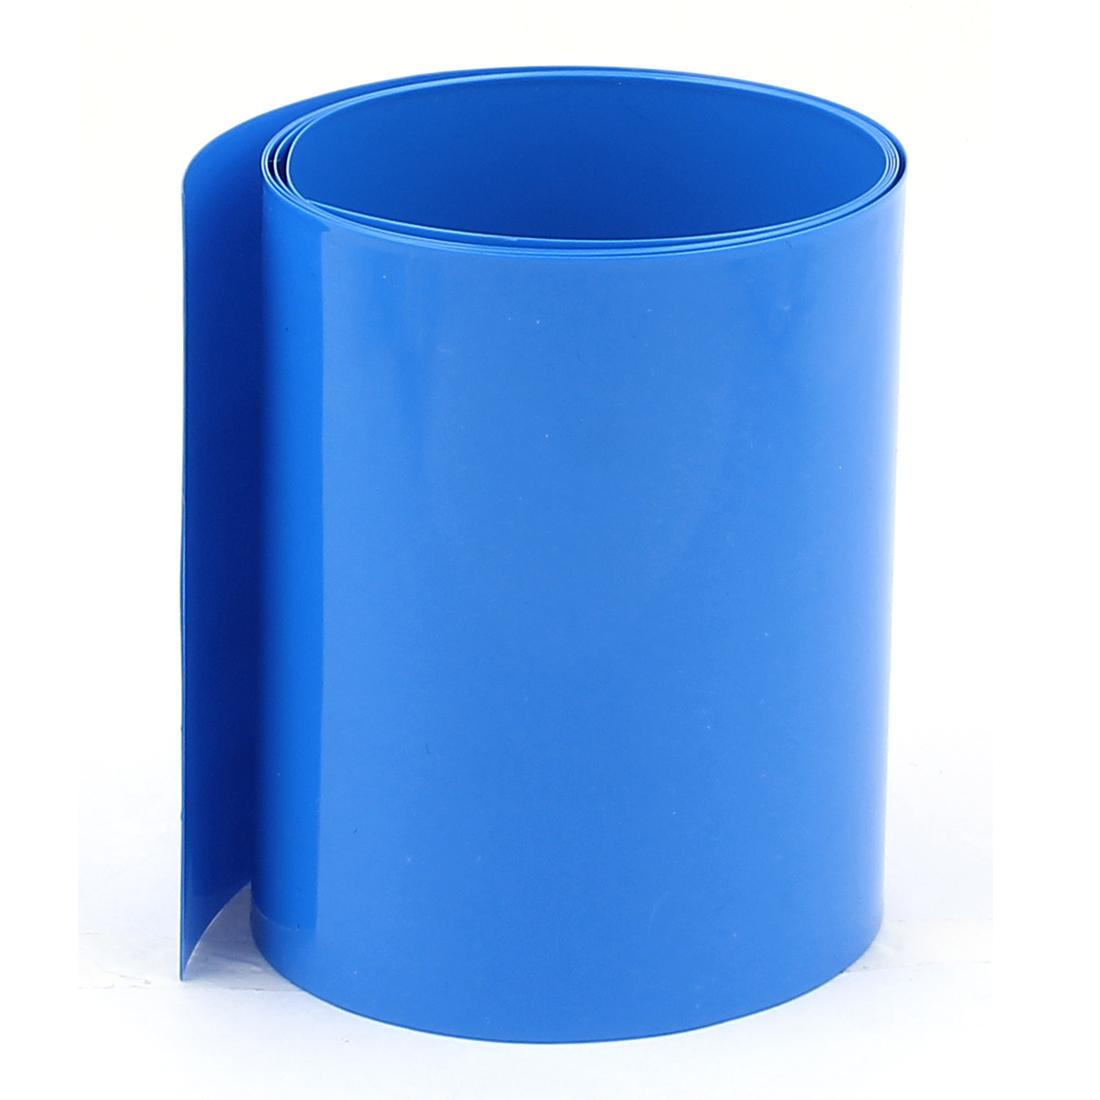 3.3ft 85mm Flat 54mm Dia PVC Heat Shrink Tubing Blue for 4 x 18650 Battery